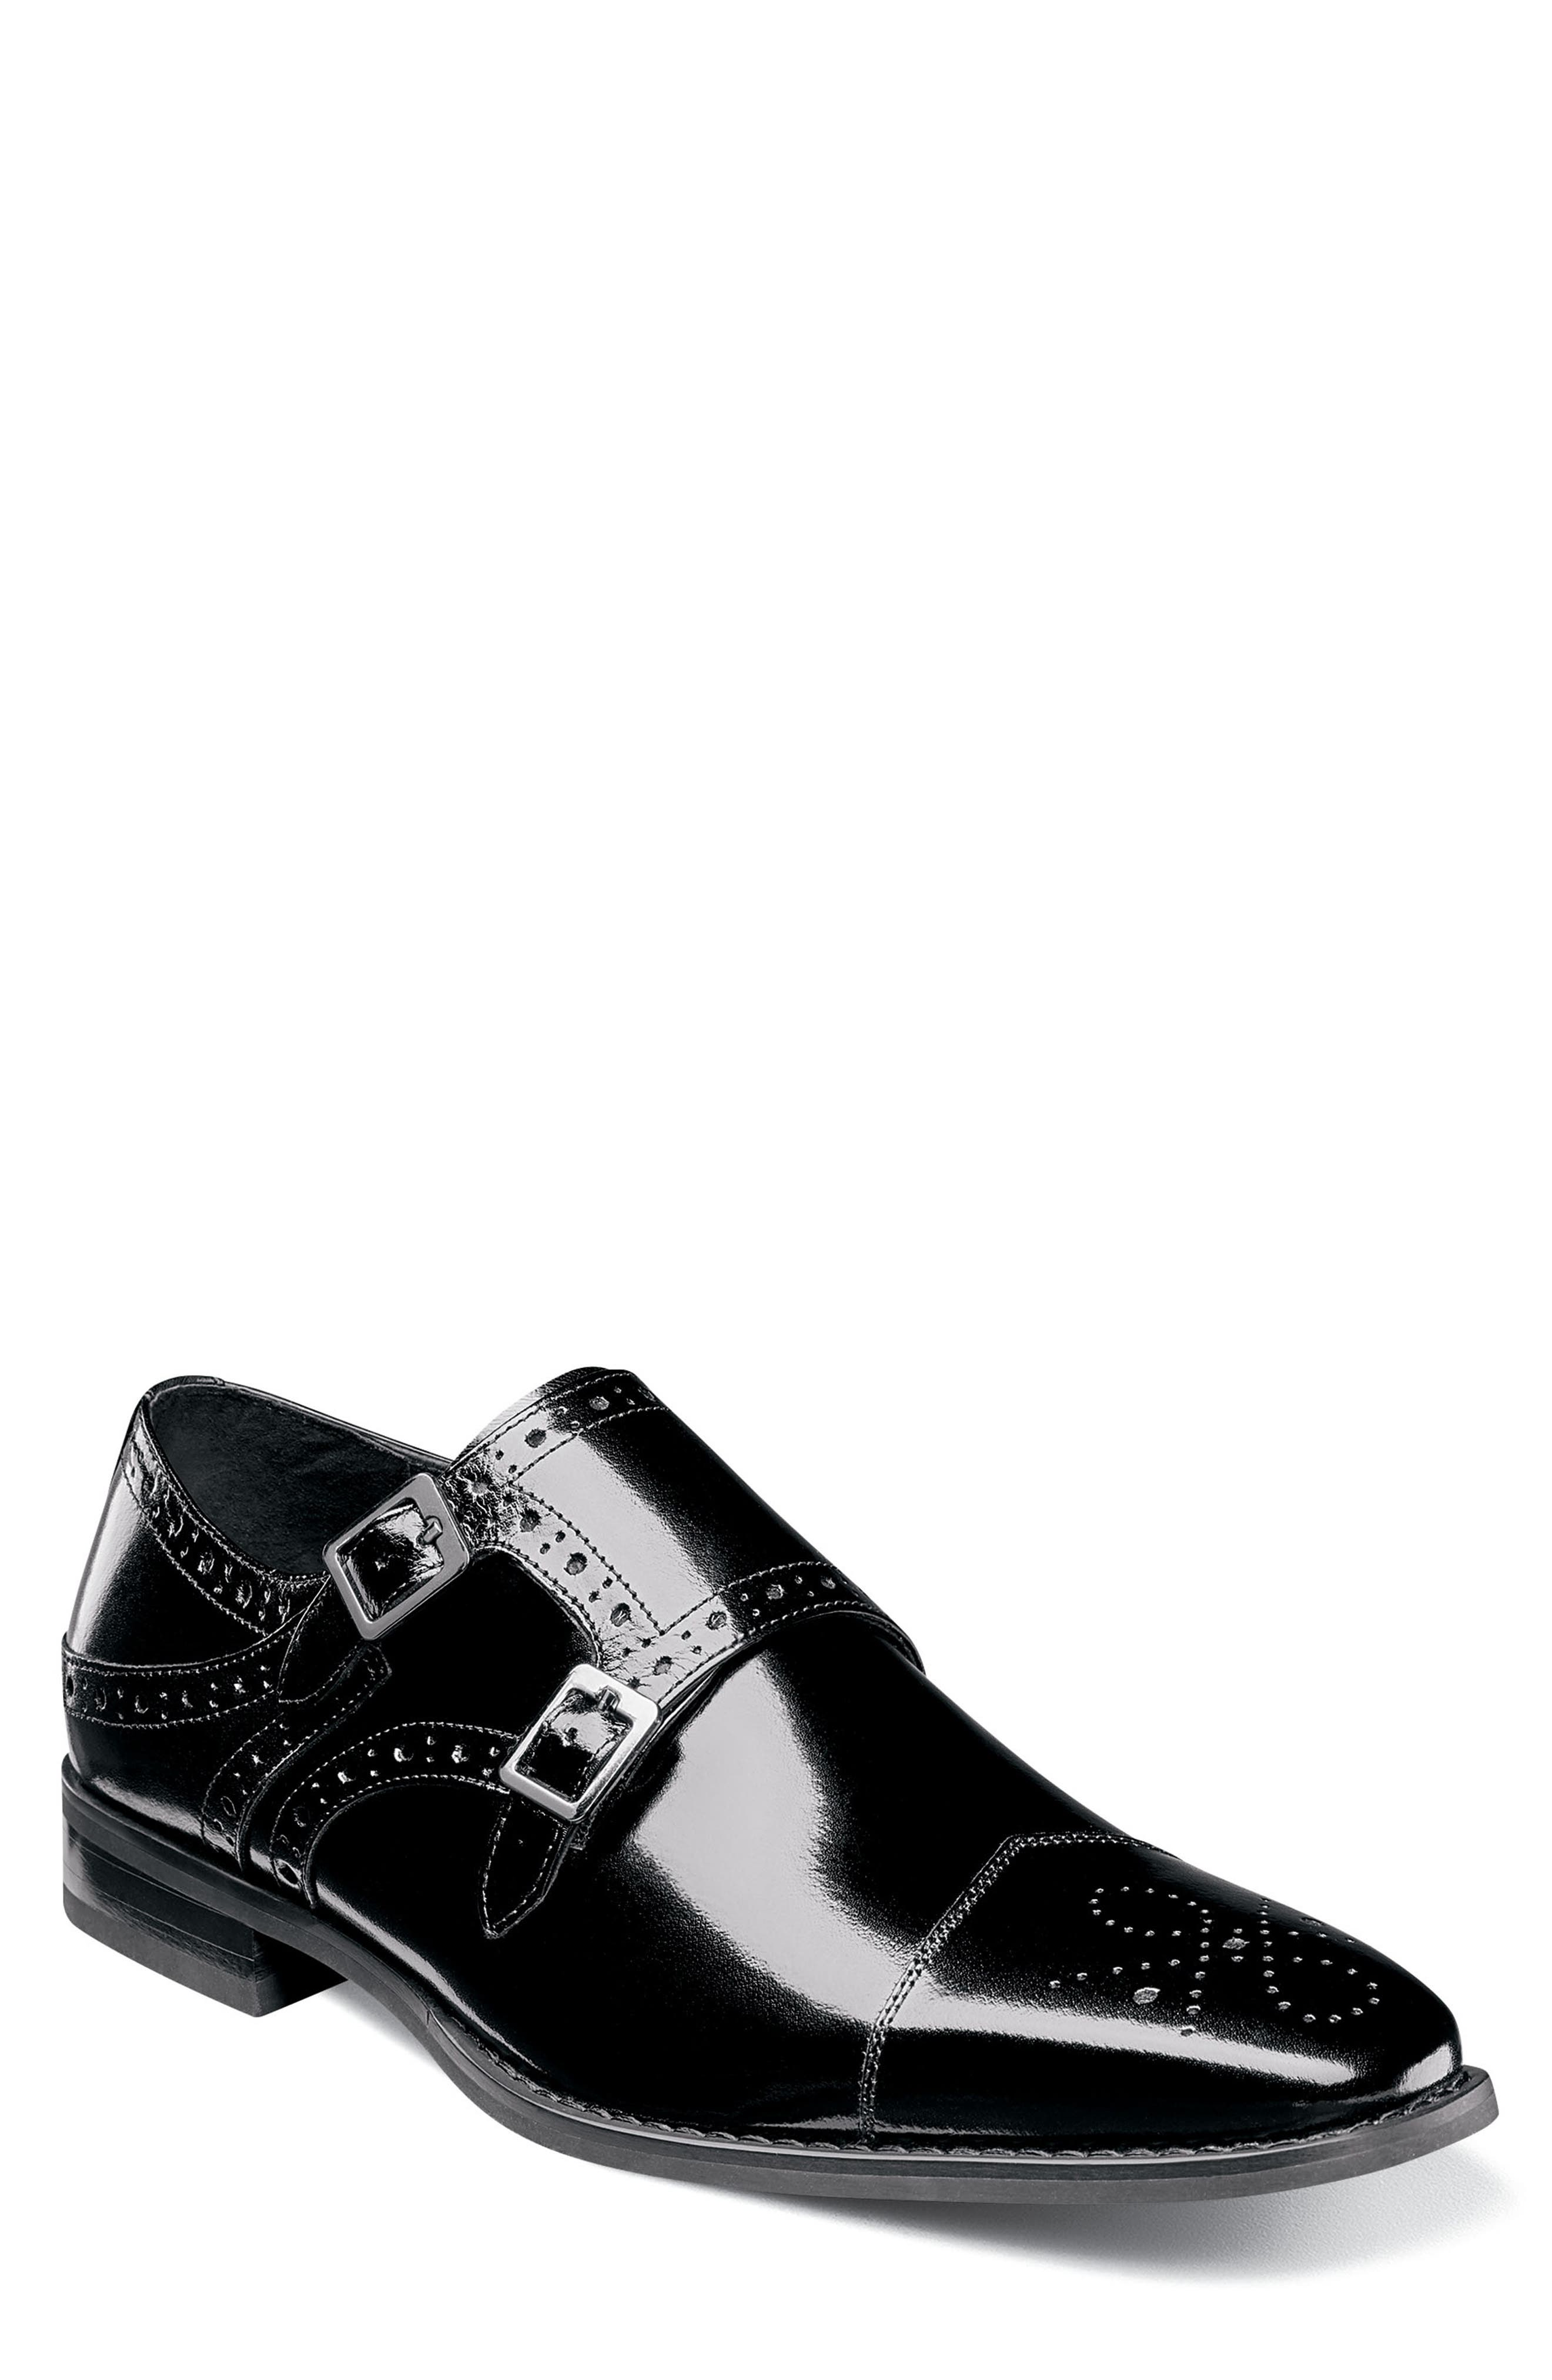 Tayton Cap Toe Double Strap Monk Shoe,                             Main thumbnail 1, color,                             001